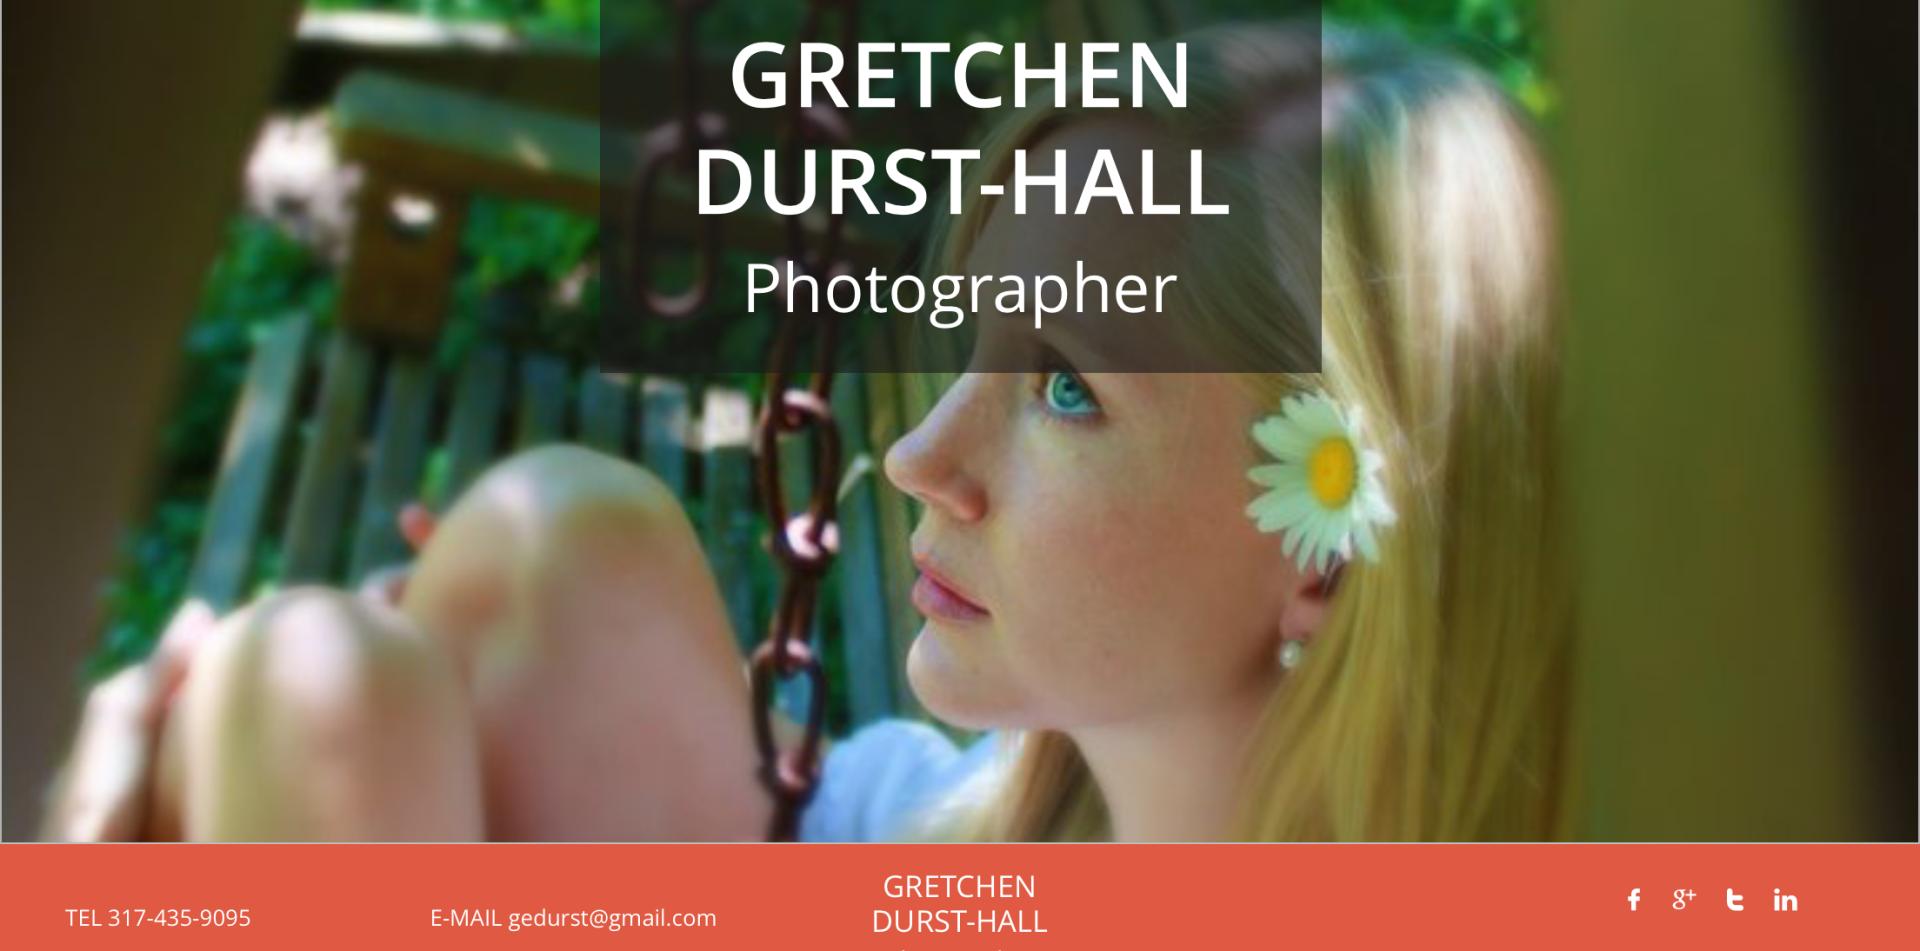 PHOTOS BY GRETCHEN